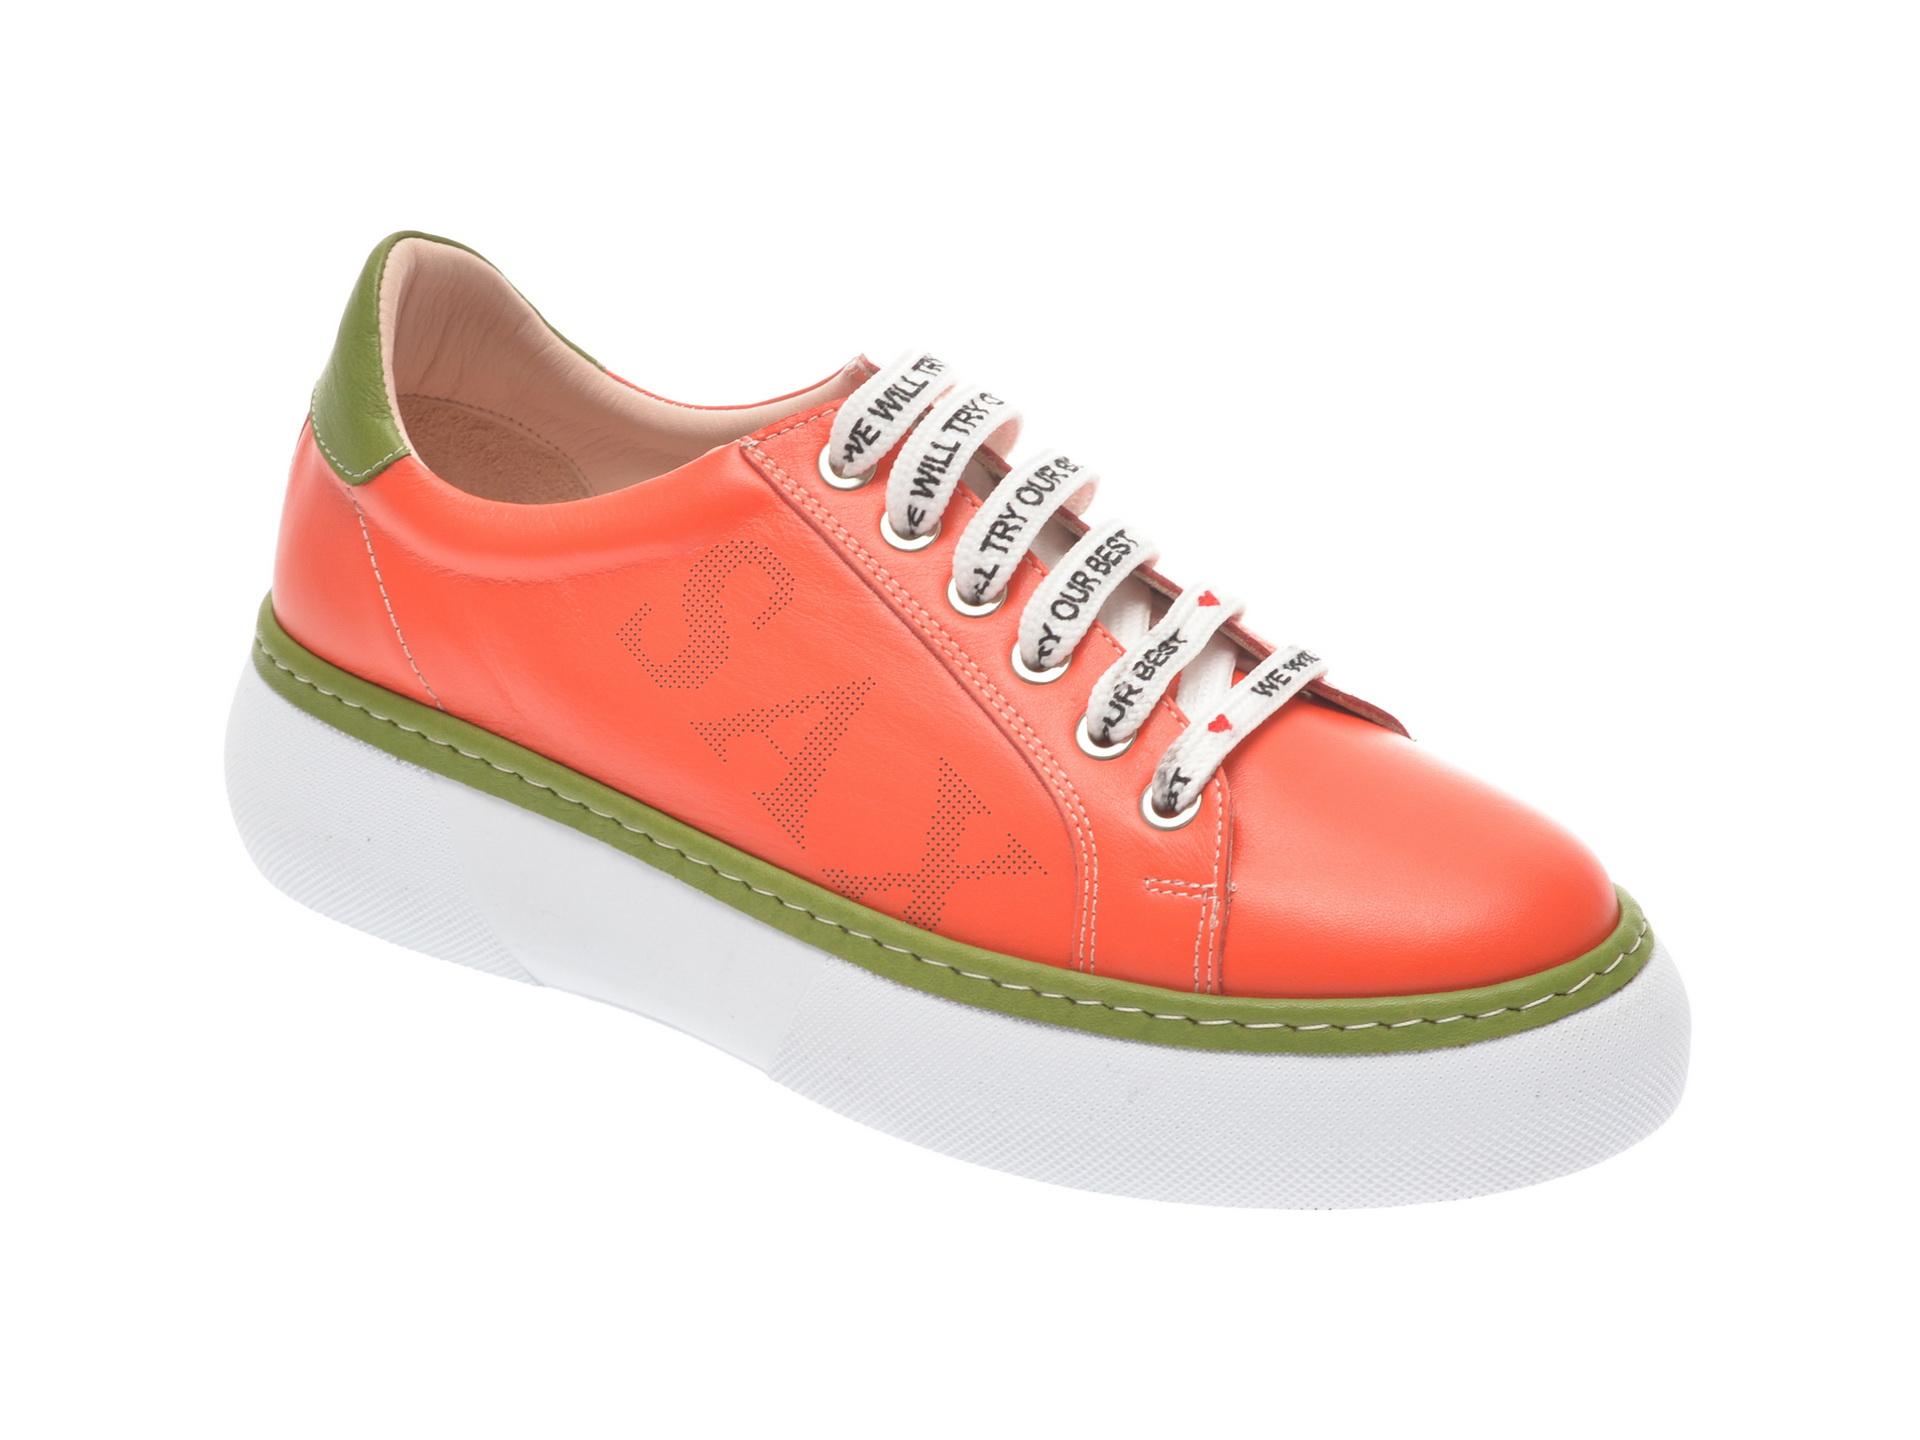 Pantofi sport FLAVIA PASSINI portocalii, 826409, din piele naturala